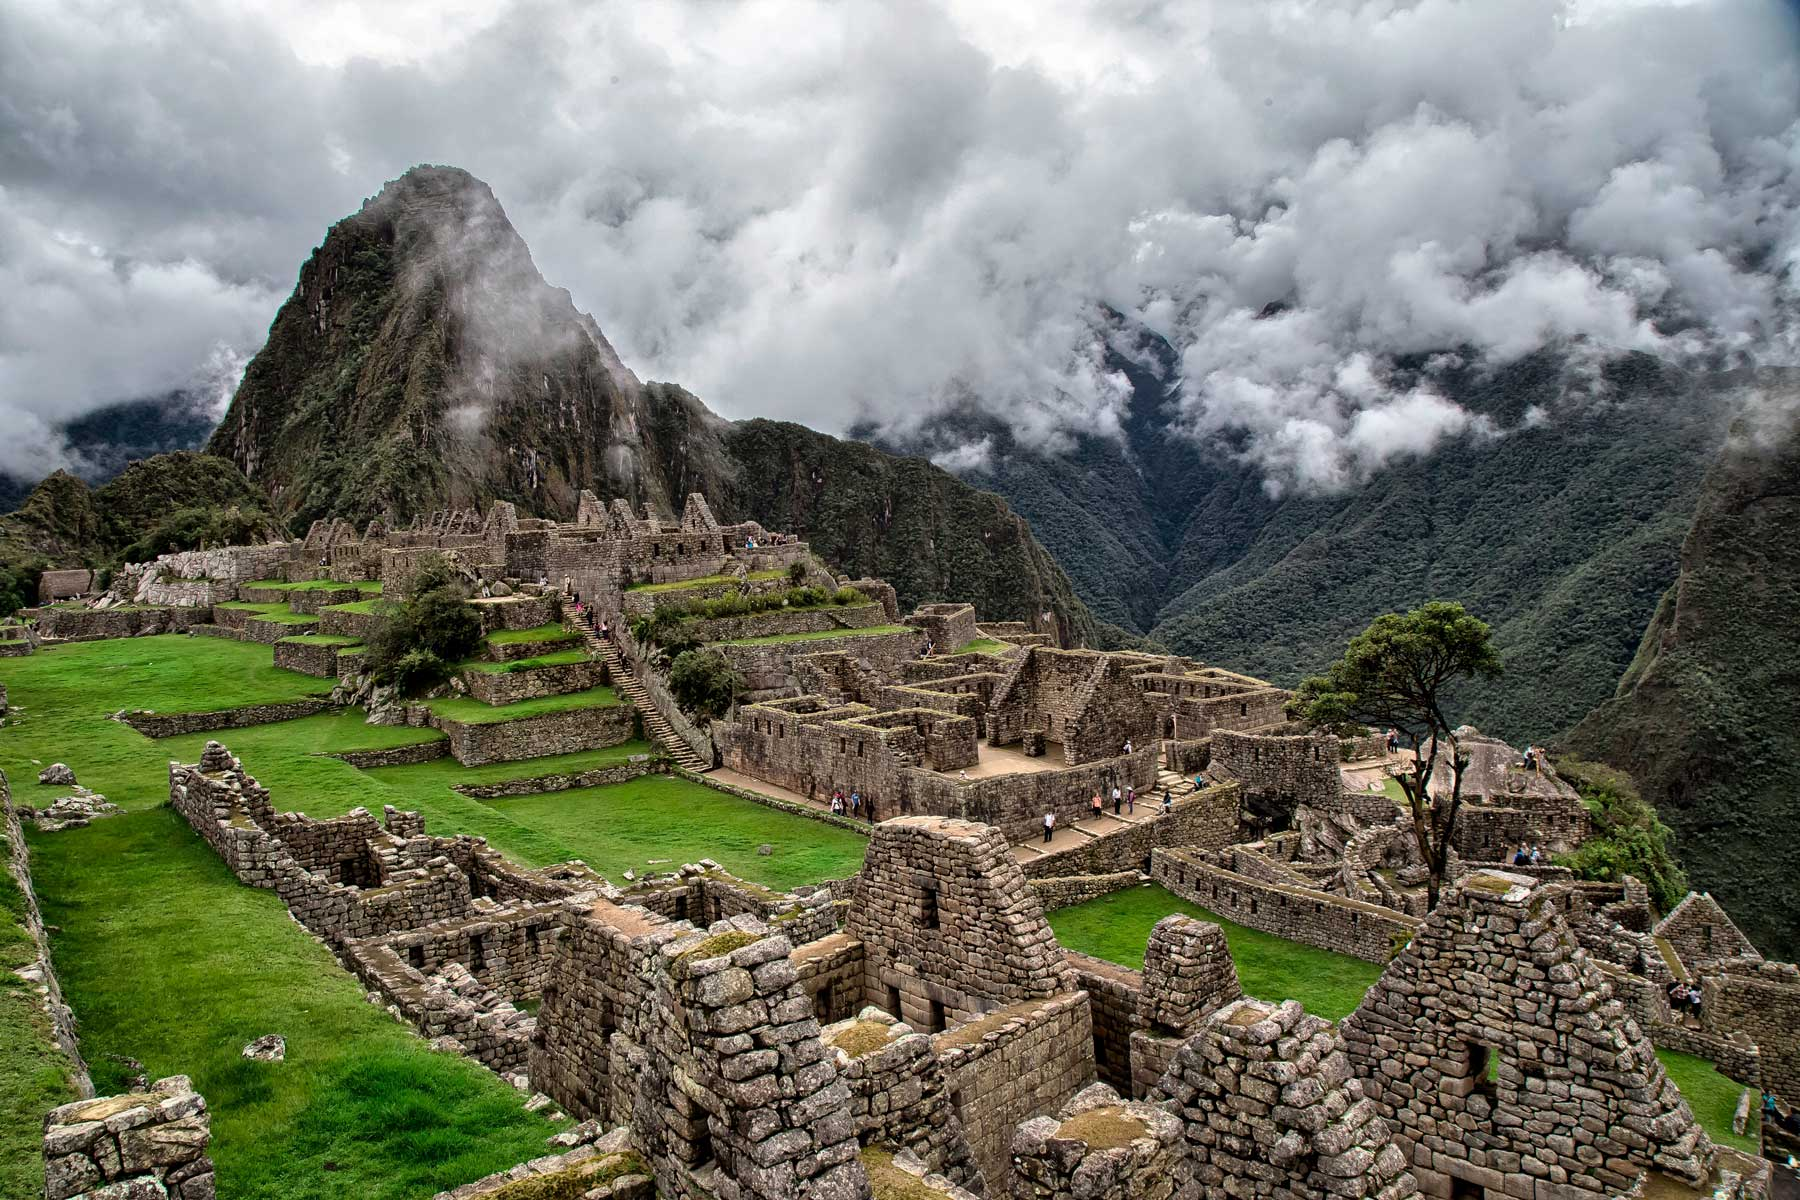 Machu Picchu Full Day Tour | Machu Picchu Tour 01 day